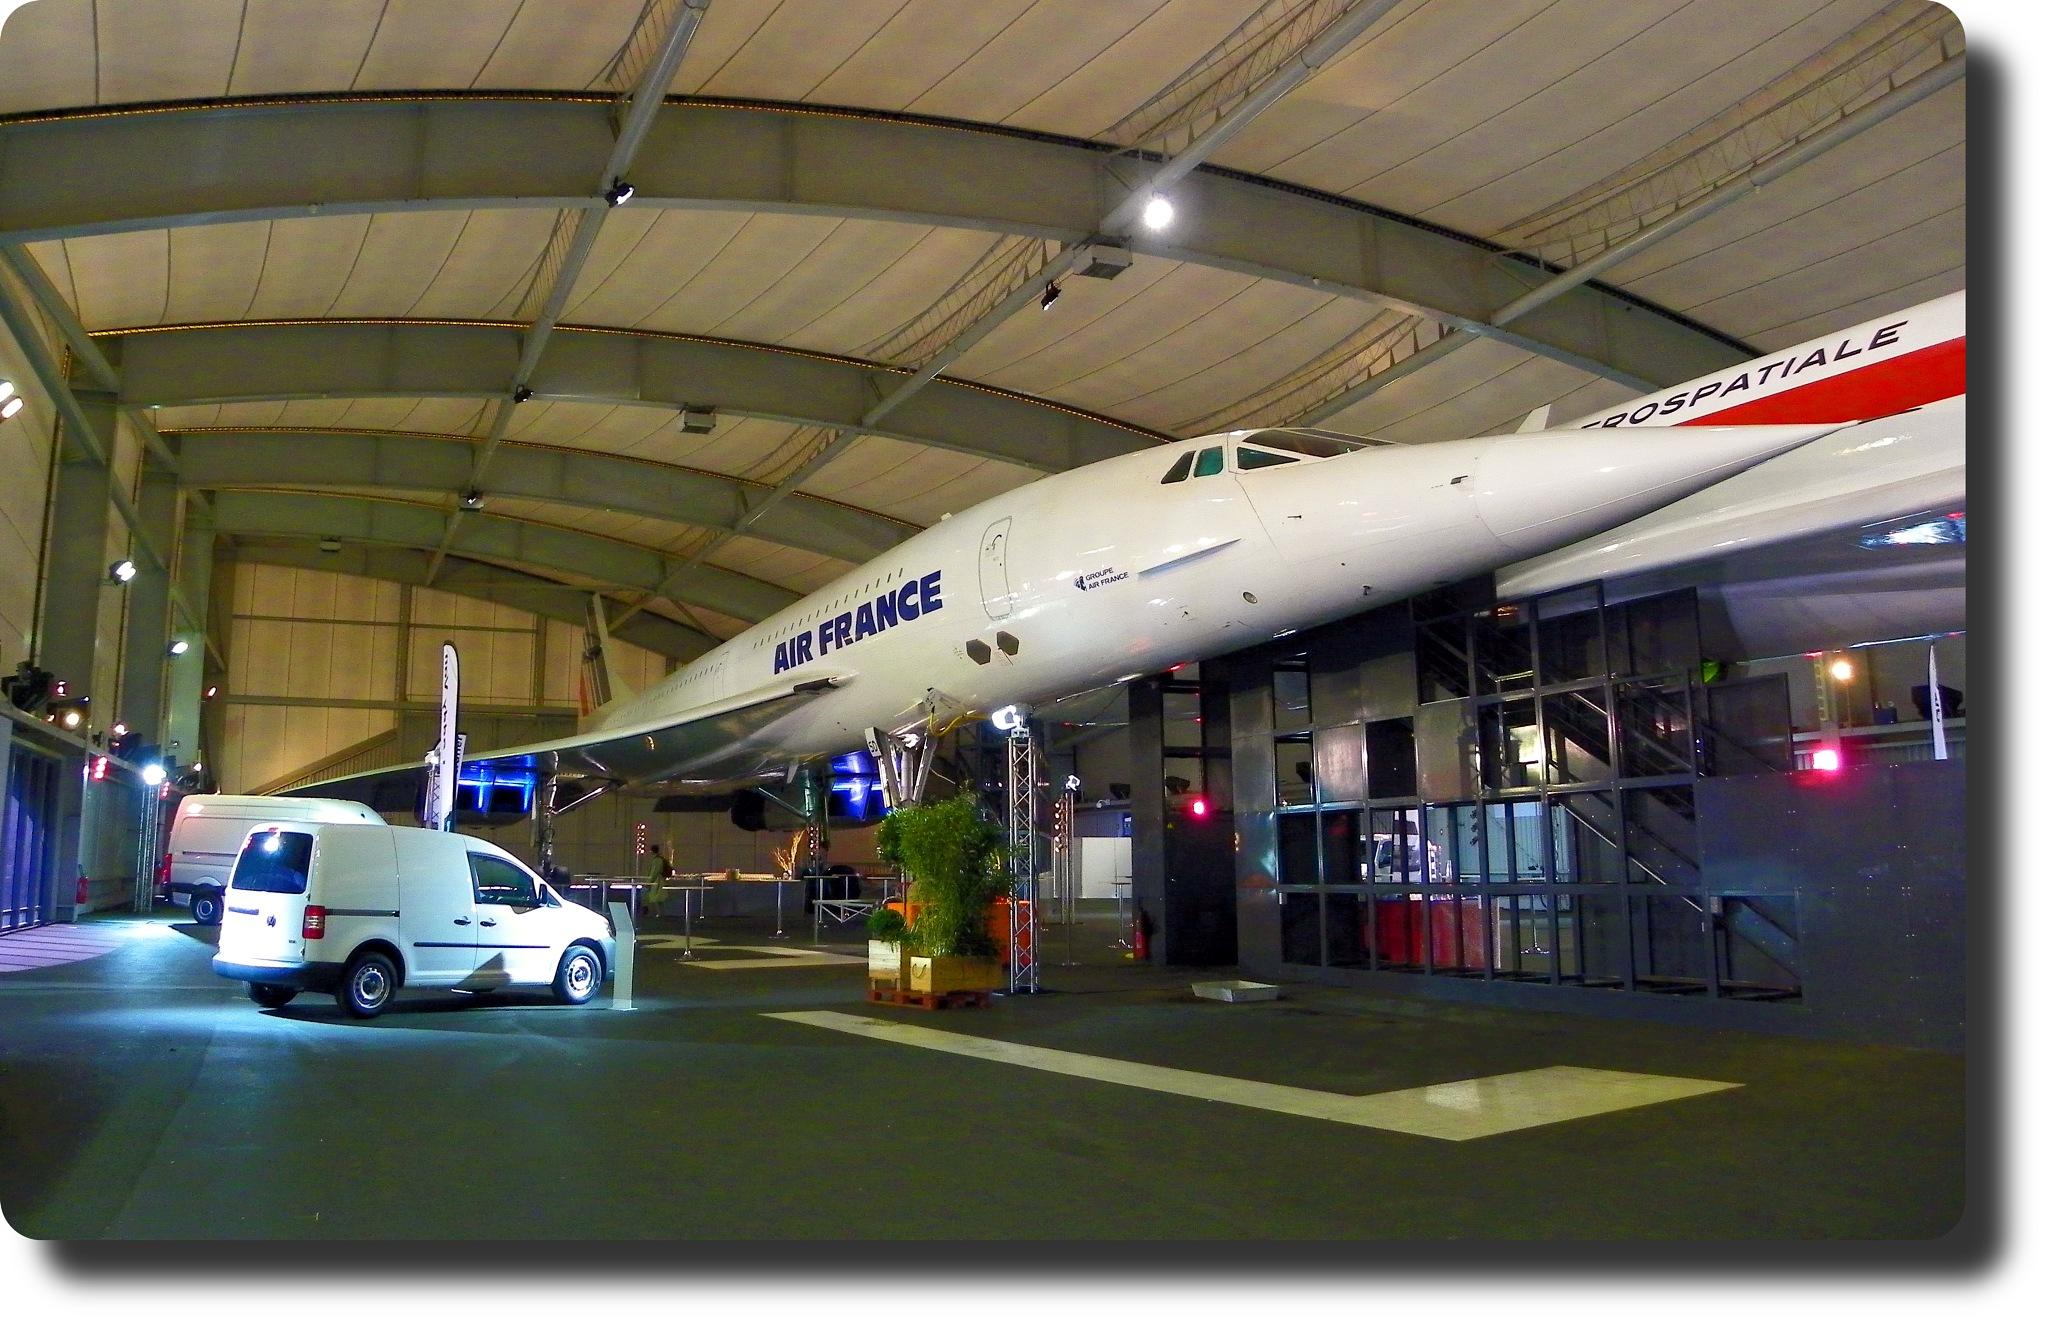 Concorde by cjcastromm